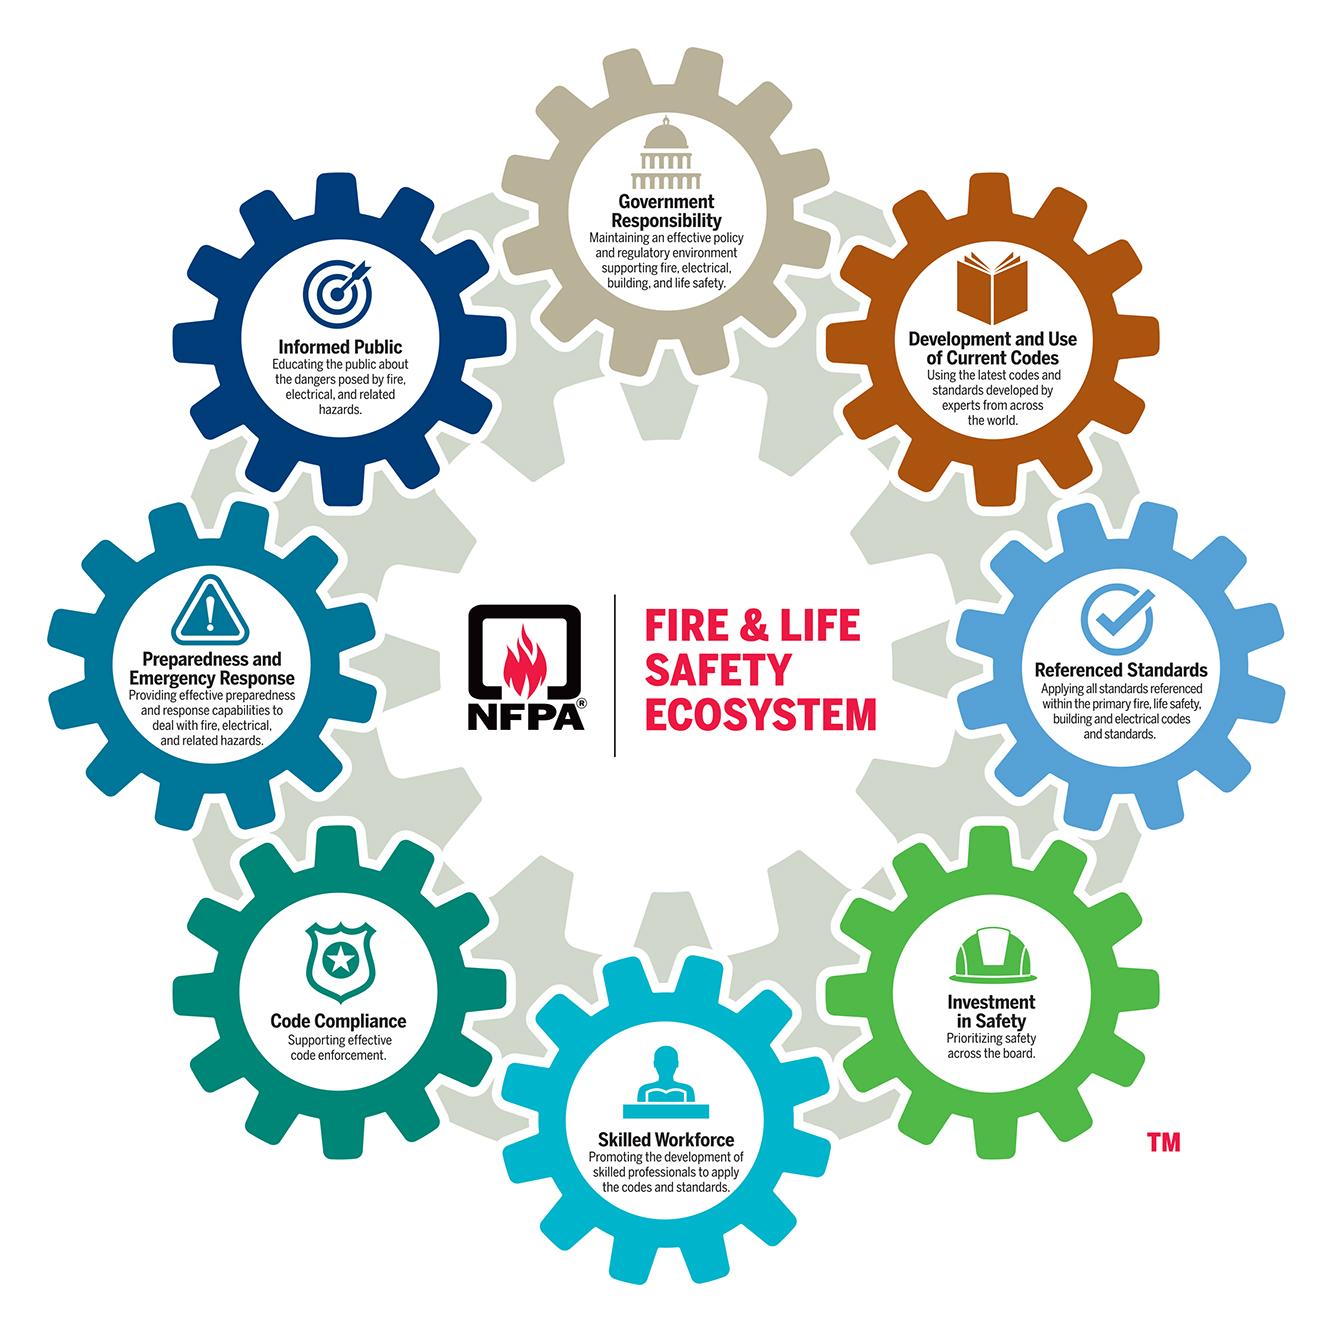 NFPA ecosystem logo